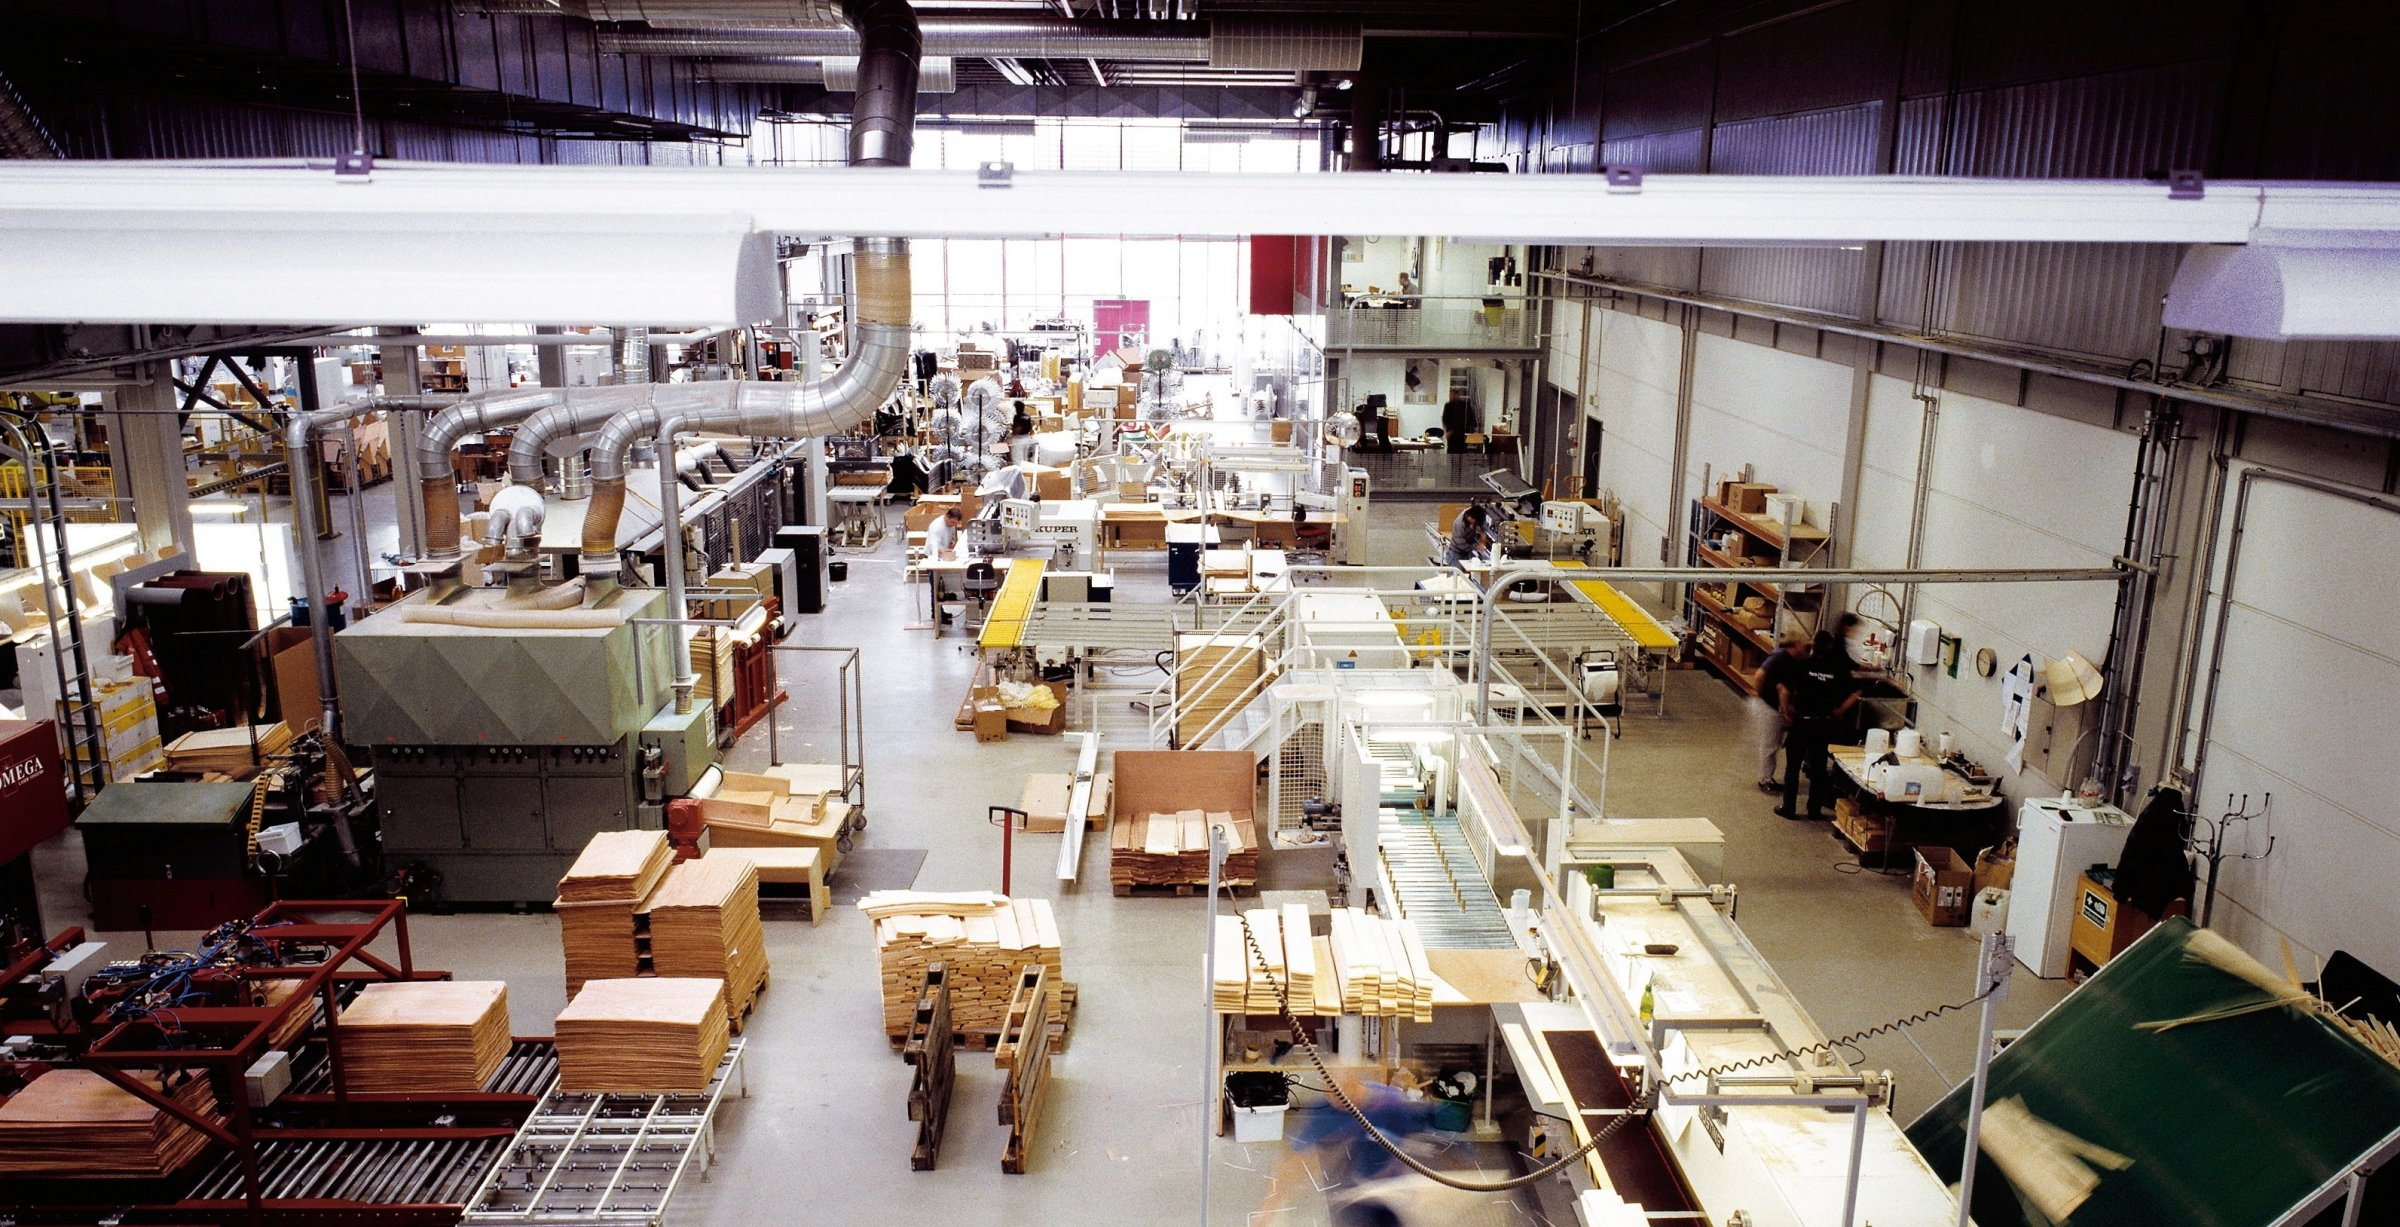 Fritz hansen satser p gr n leverand rstyring - Fabricas de muebles en yecla ...